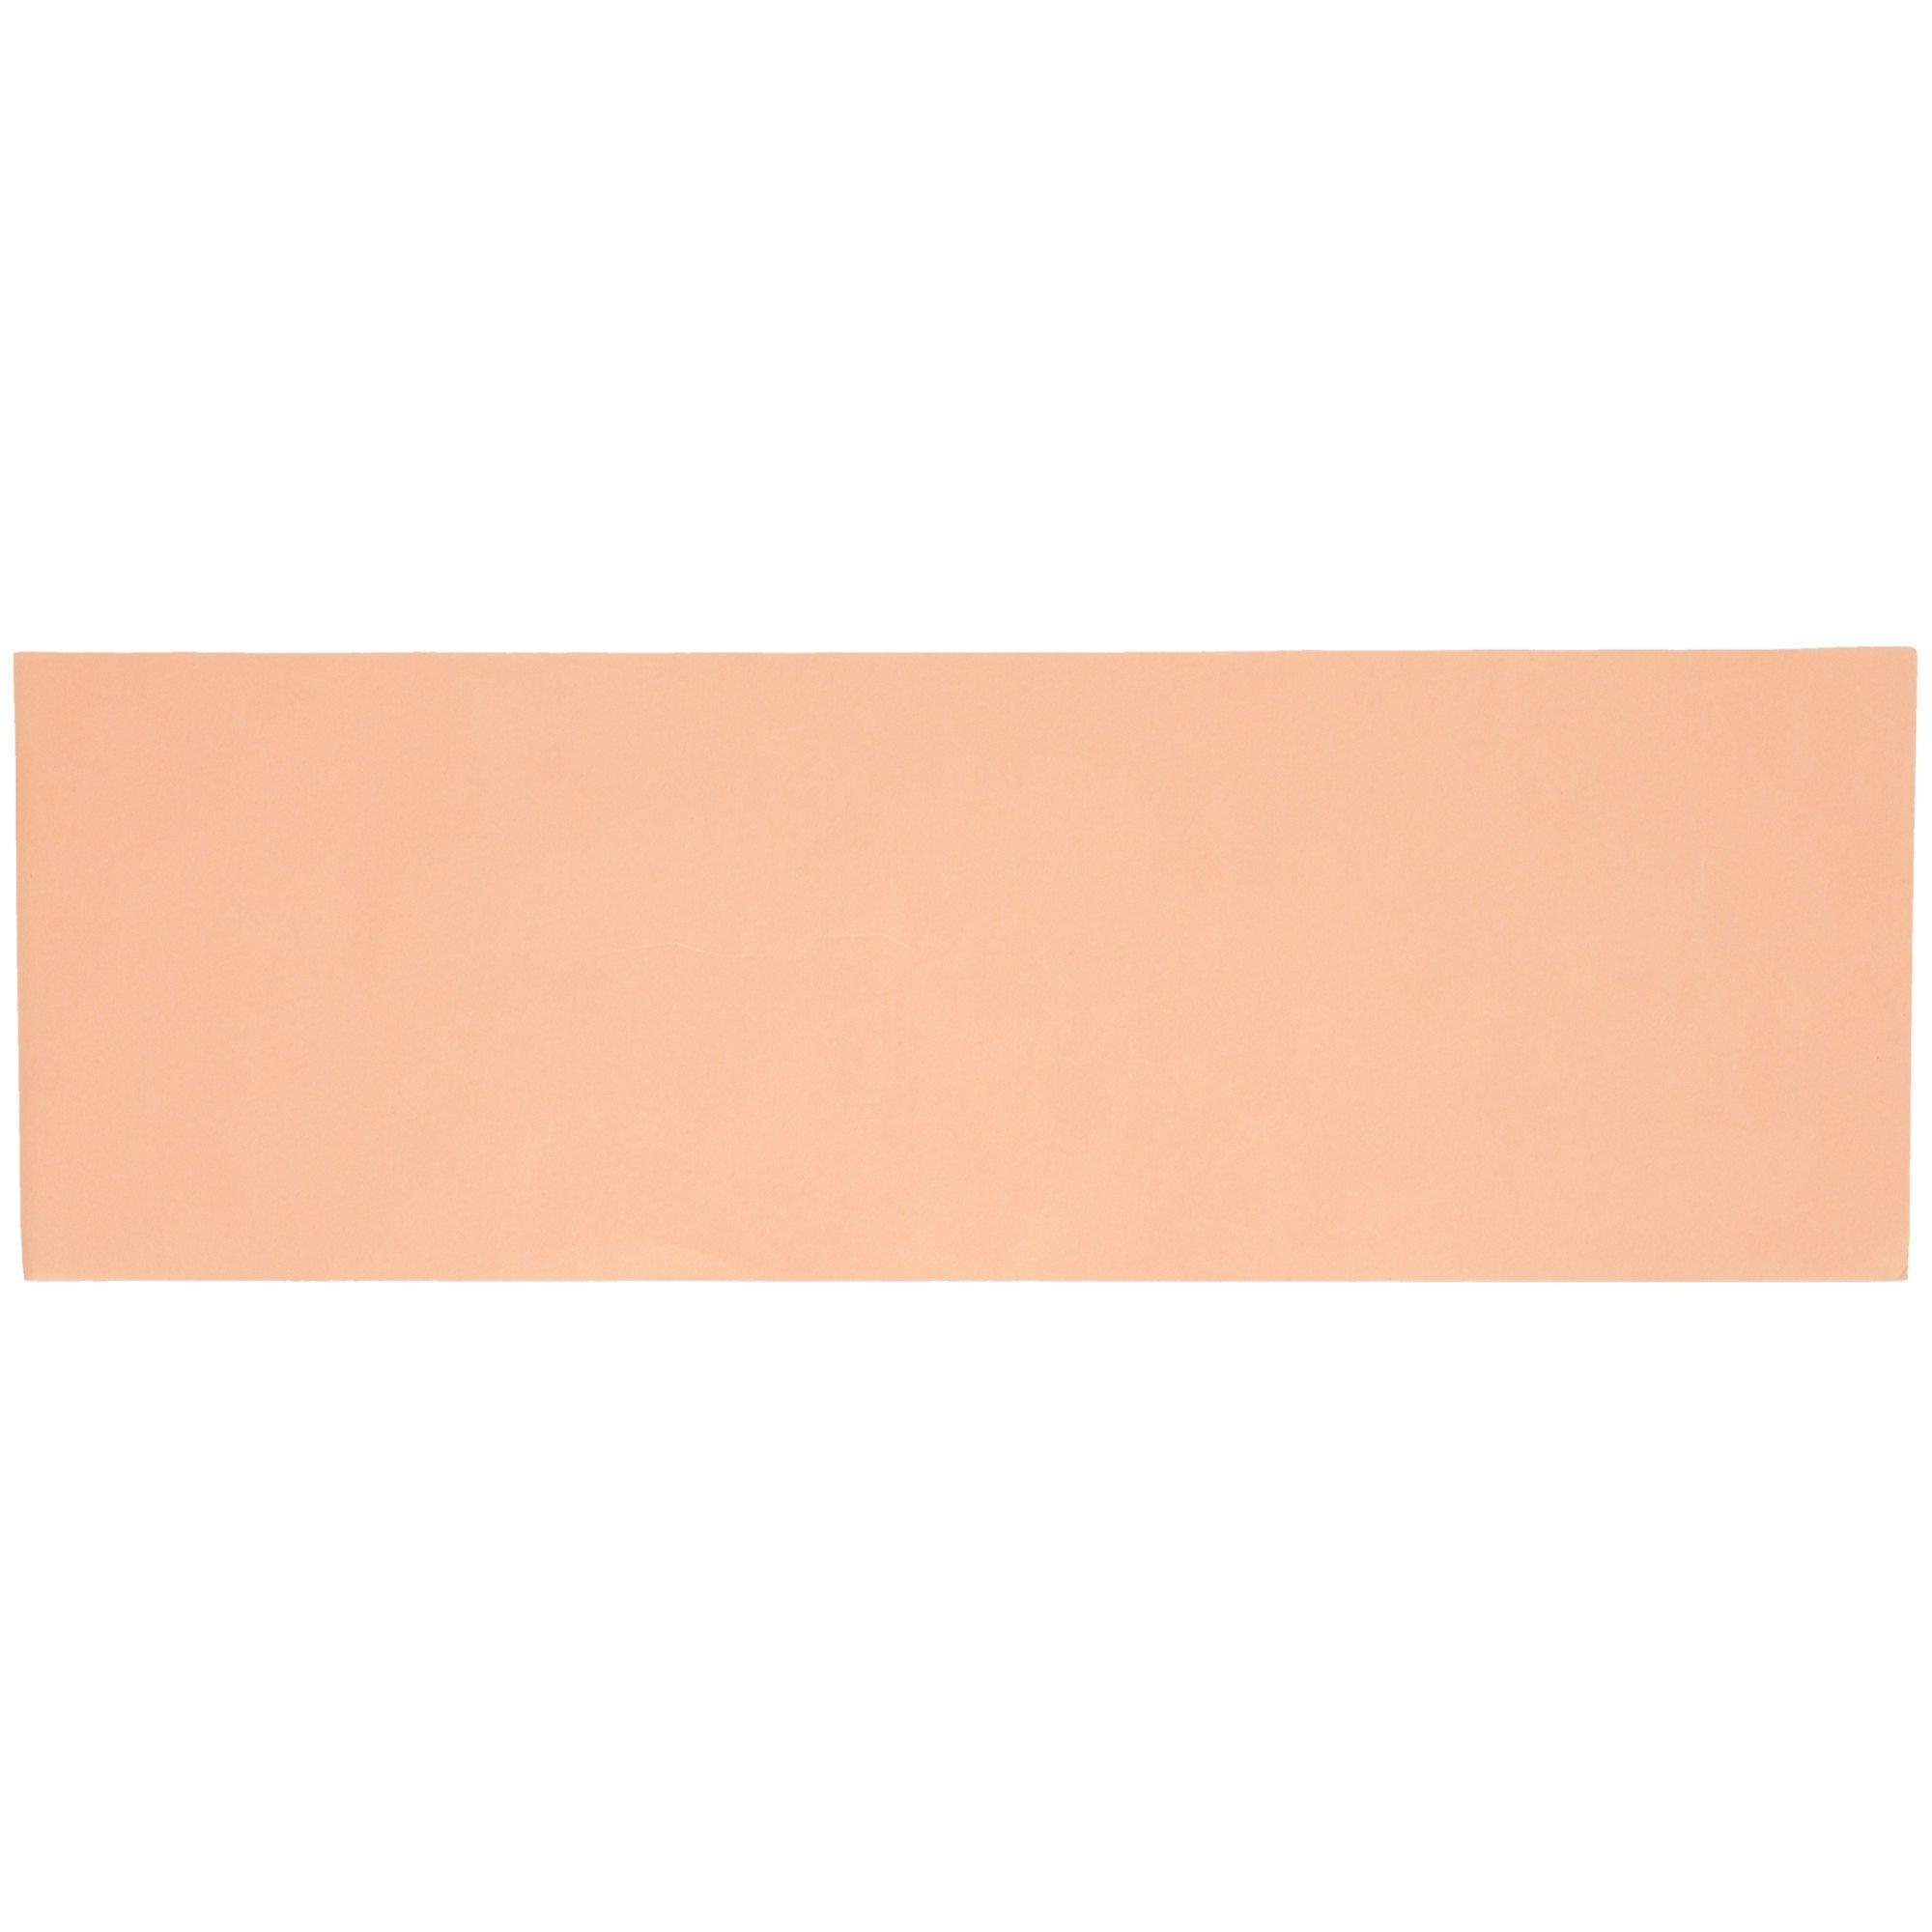 LitePeachTreat Steak Paper Sheets - 1000/Case 10'' x 30'' 40#